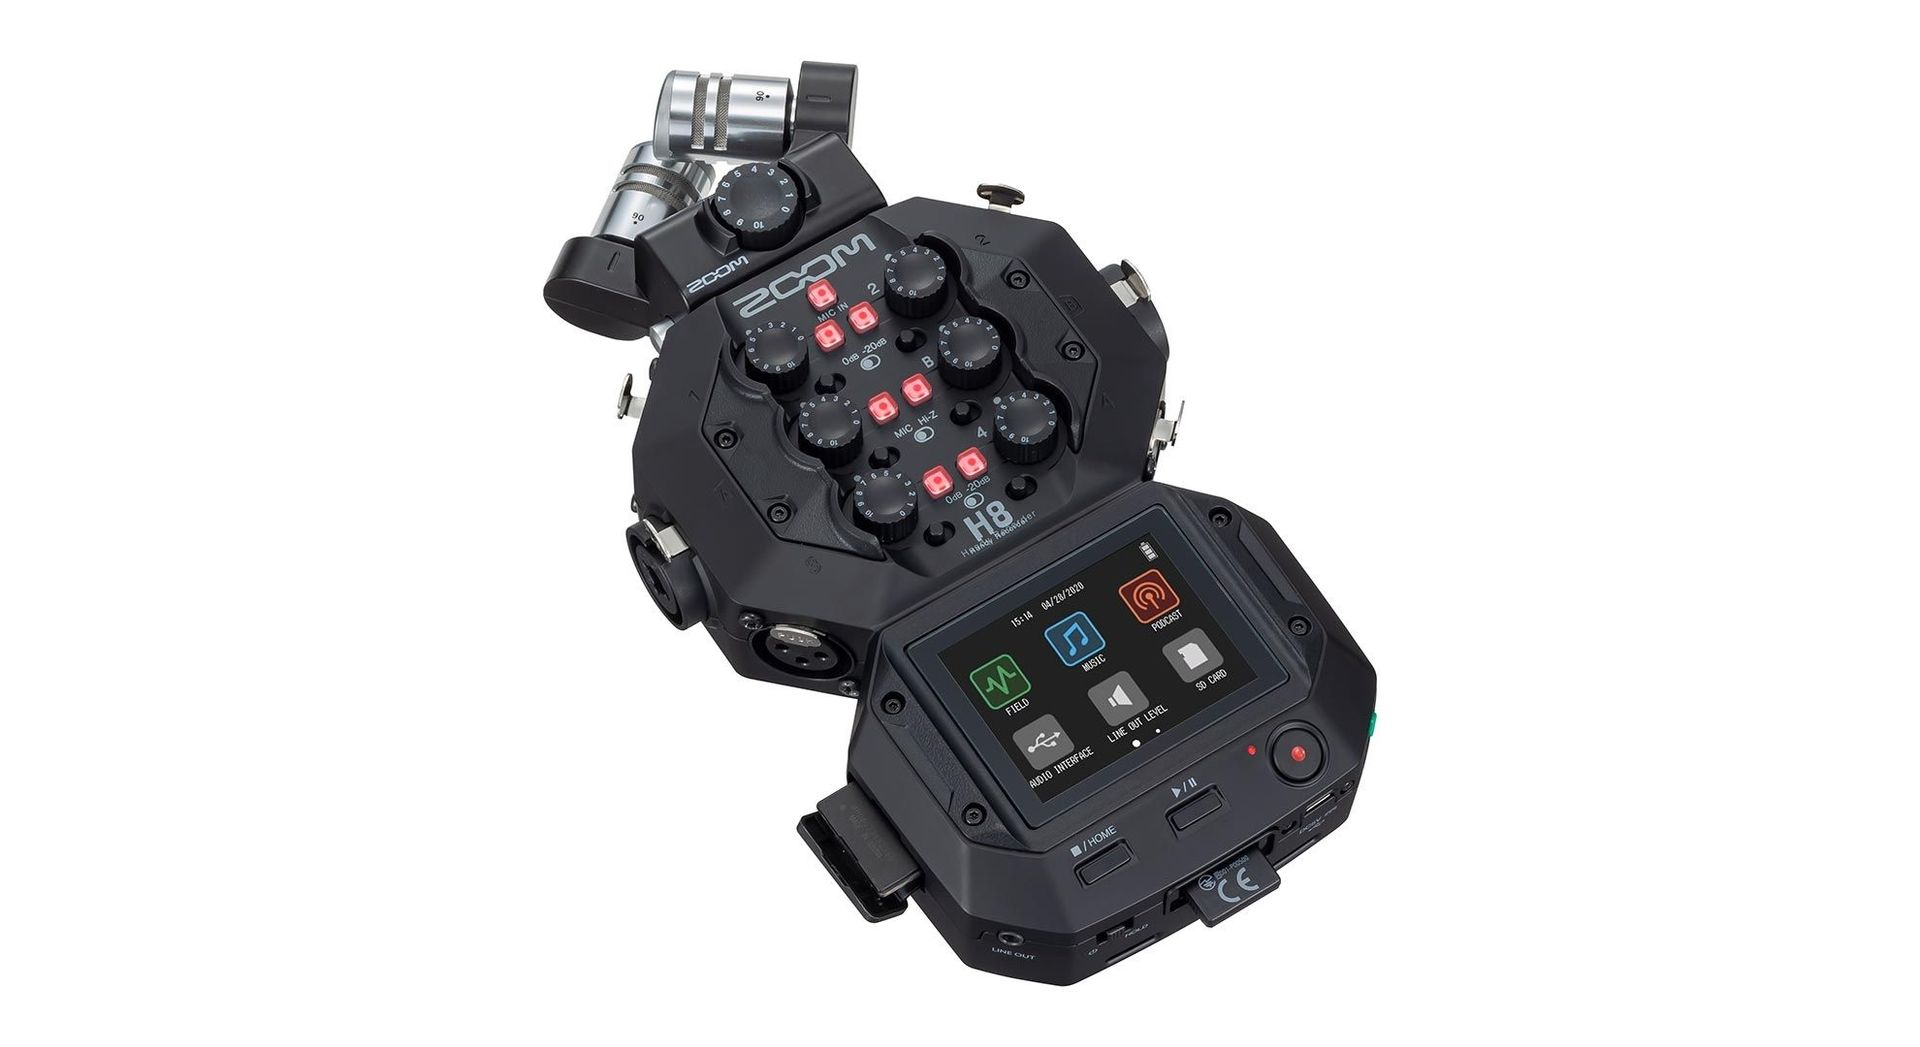 Zoom H8 tragbarer 12 Spur Audio Recorder Handy Recorder